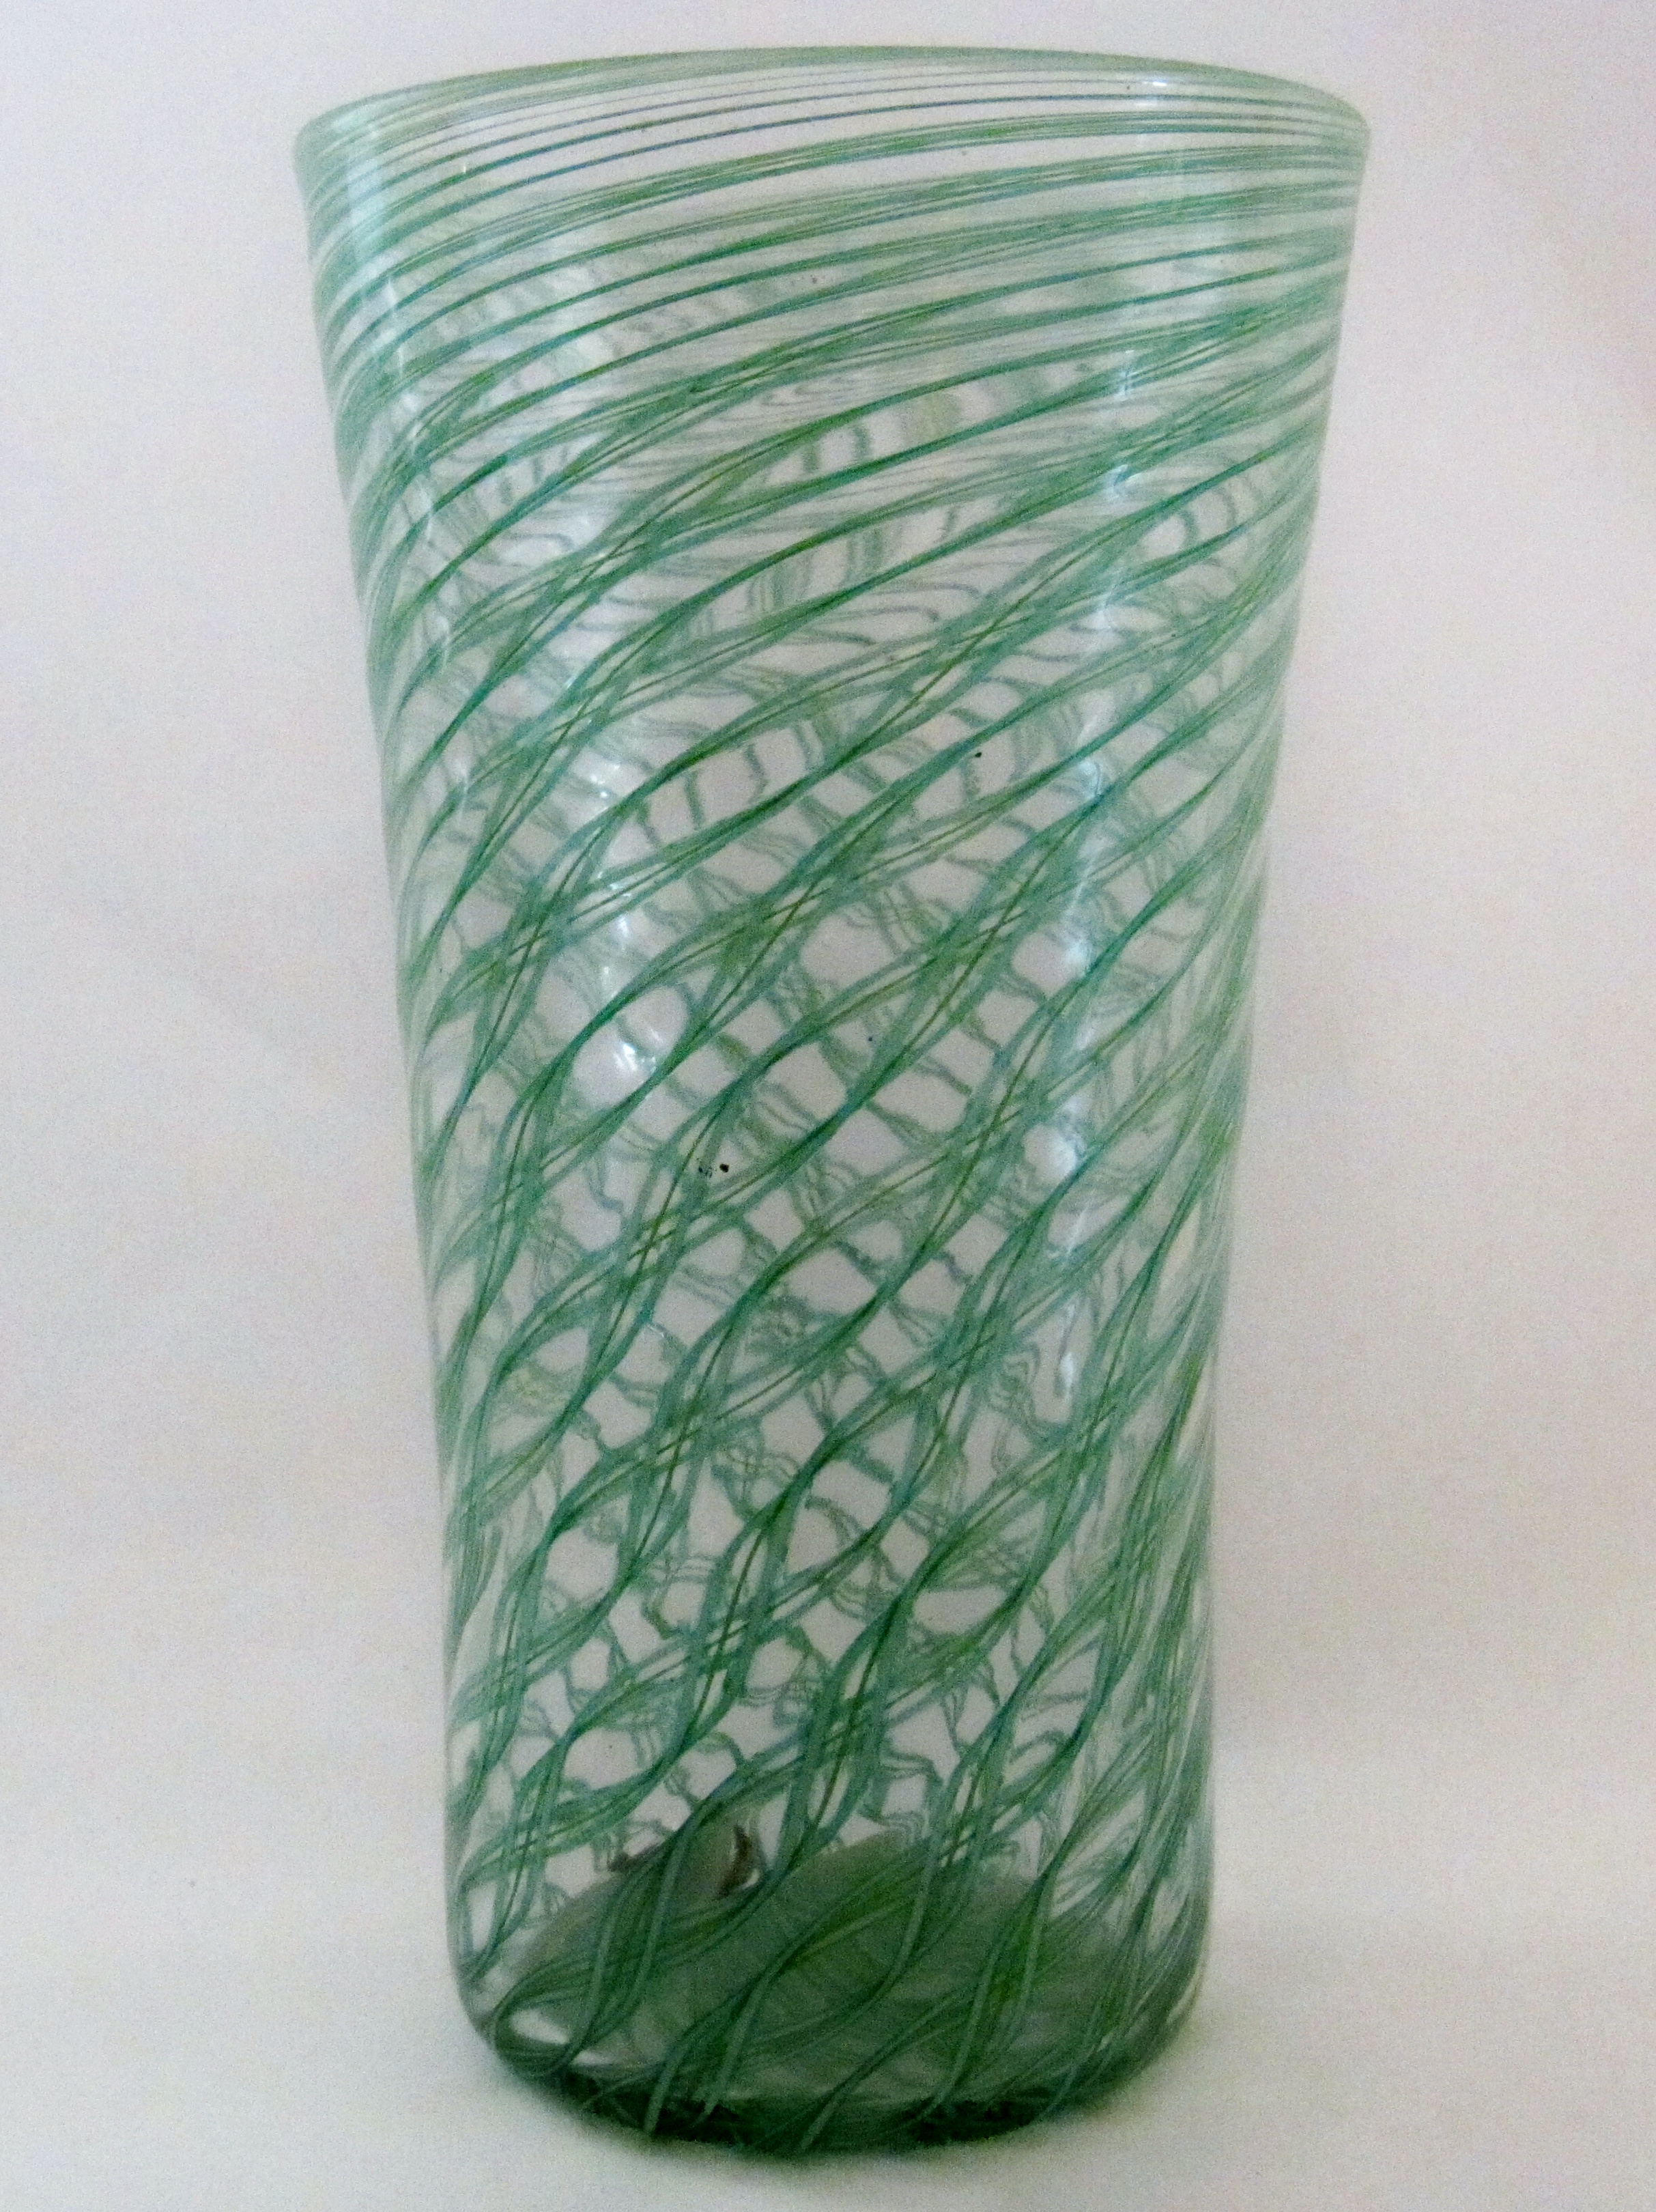 Light Green Cane Glass 3.jpg